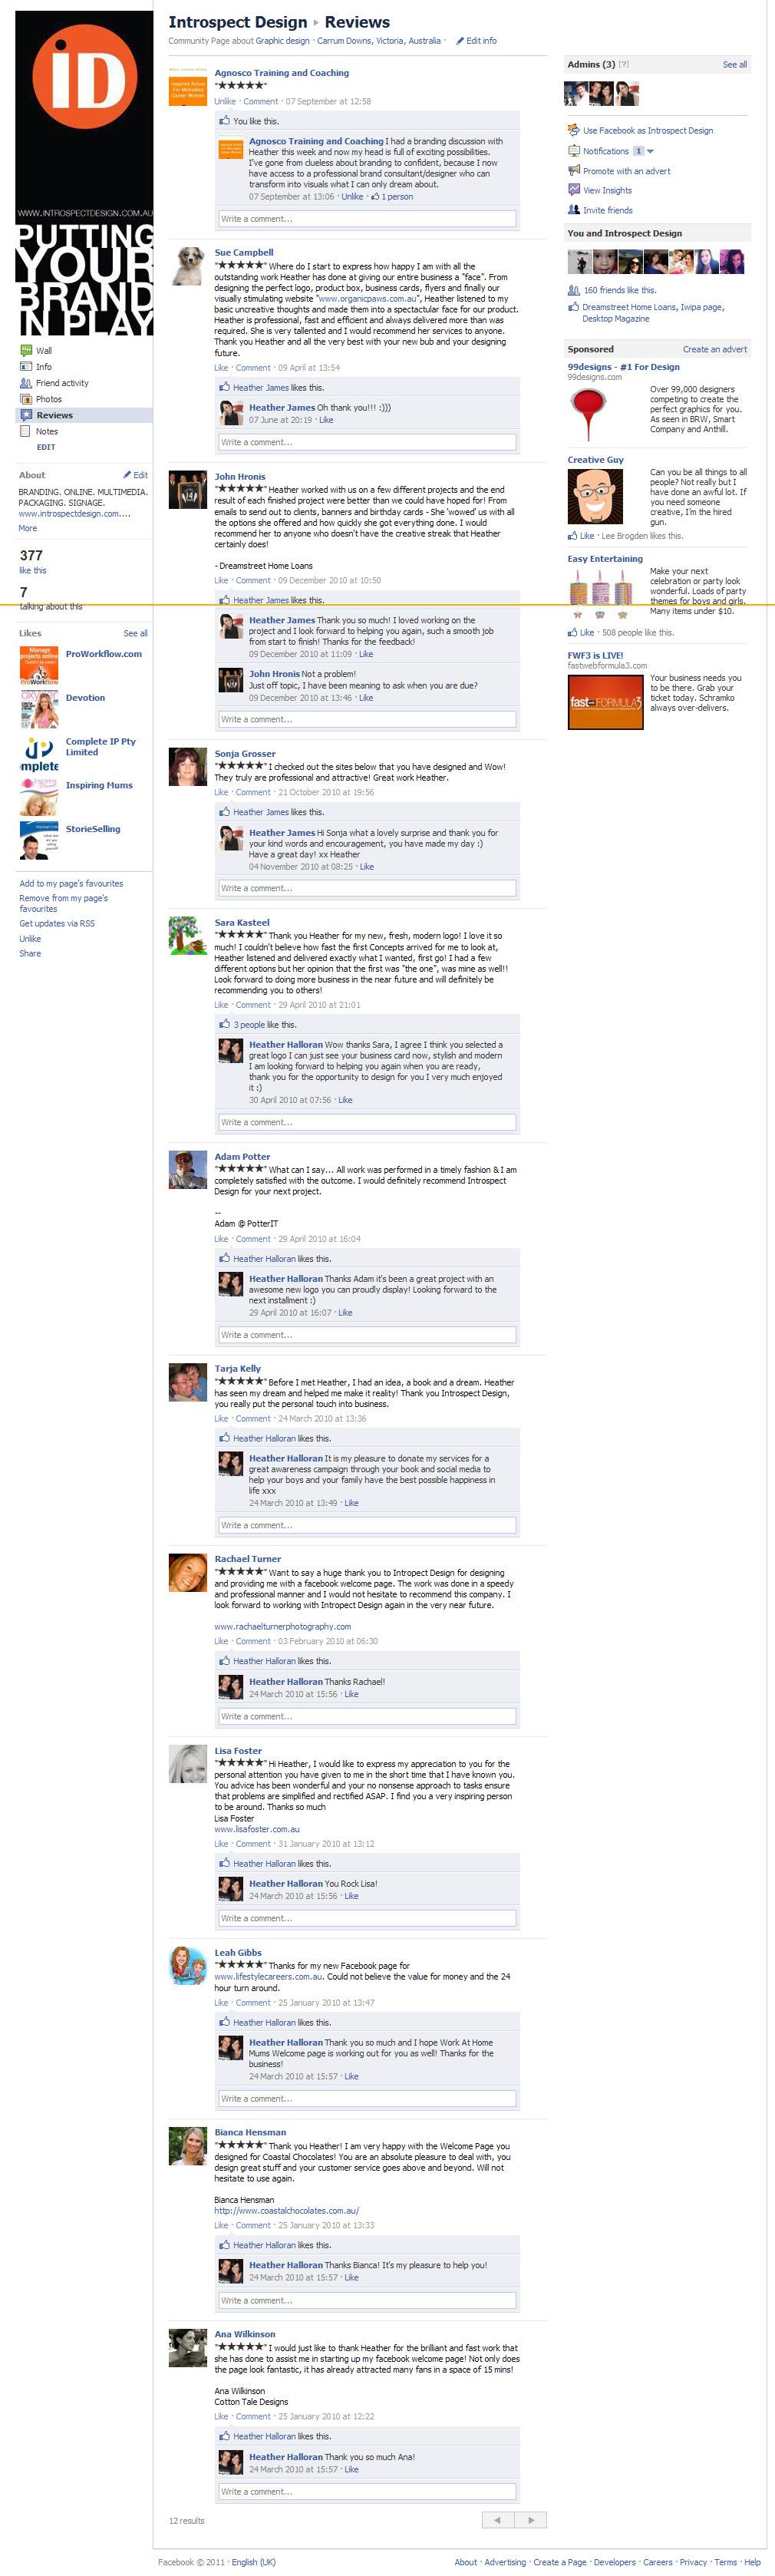 Introspect Facebook Reviews 2011.jpg